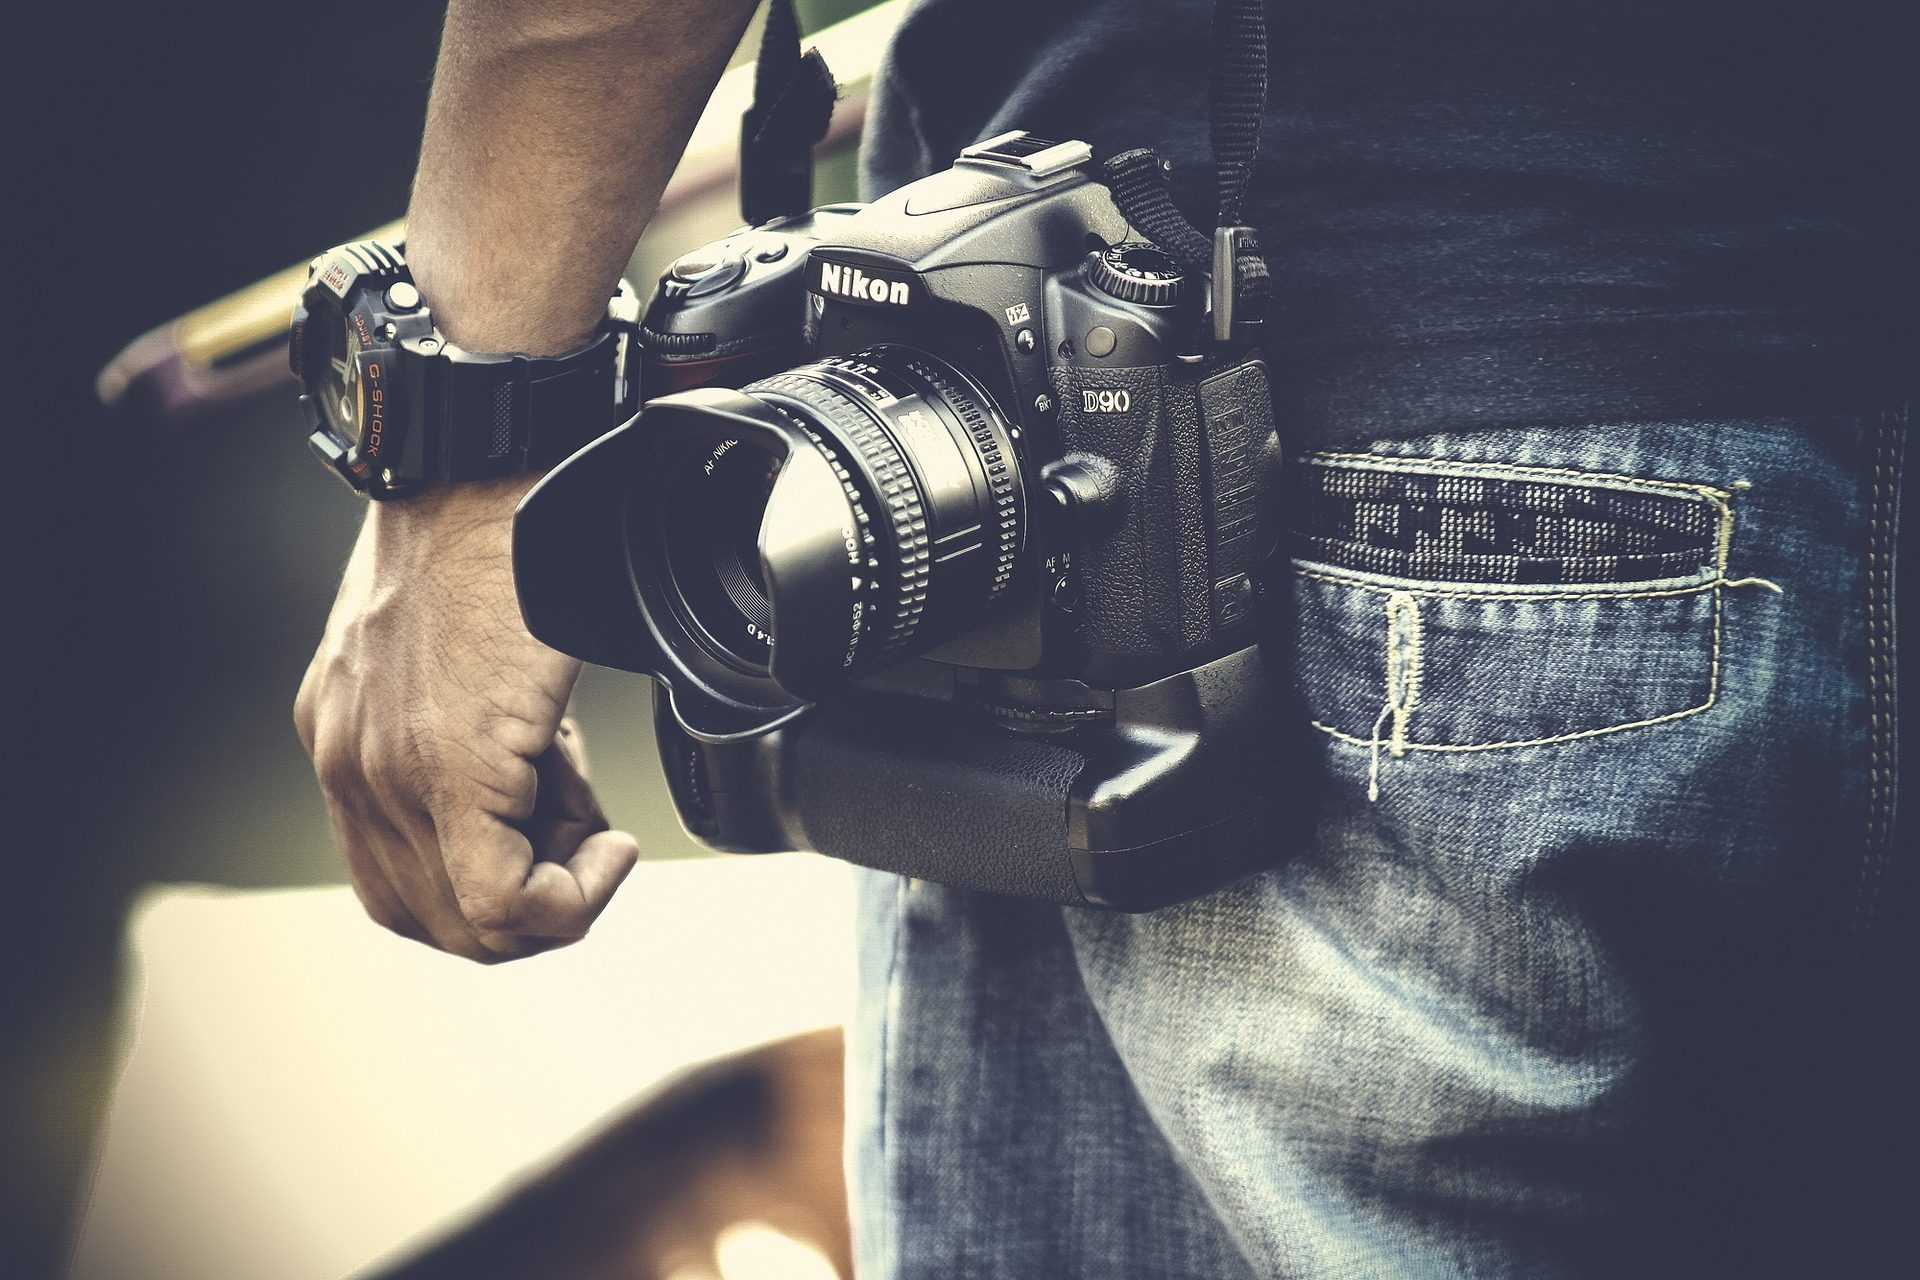 カメラ, 写真, 男, 写真家, 反射, 手, 時計 - HD の壁紙 - 教授-falken.com